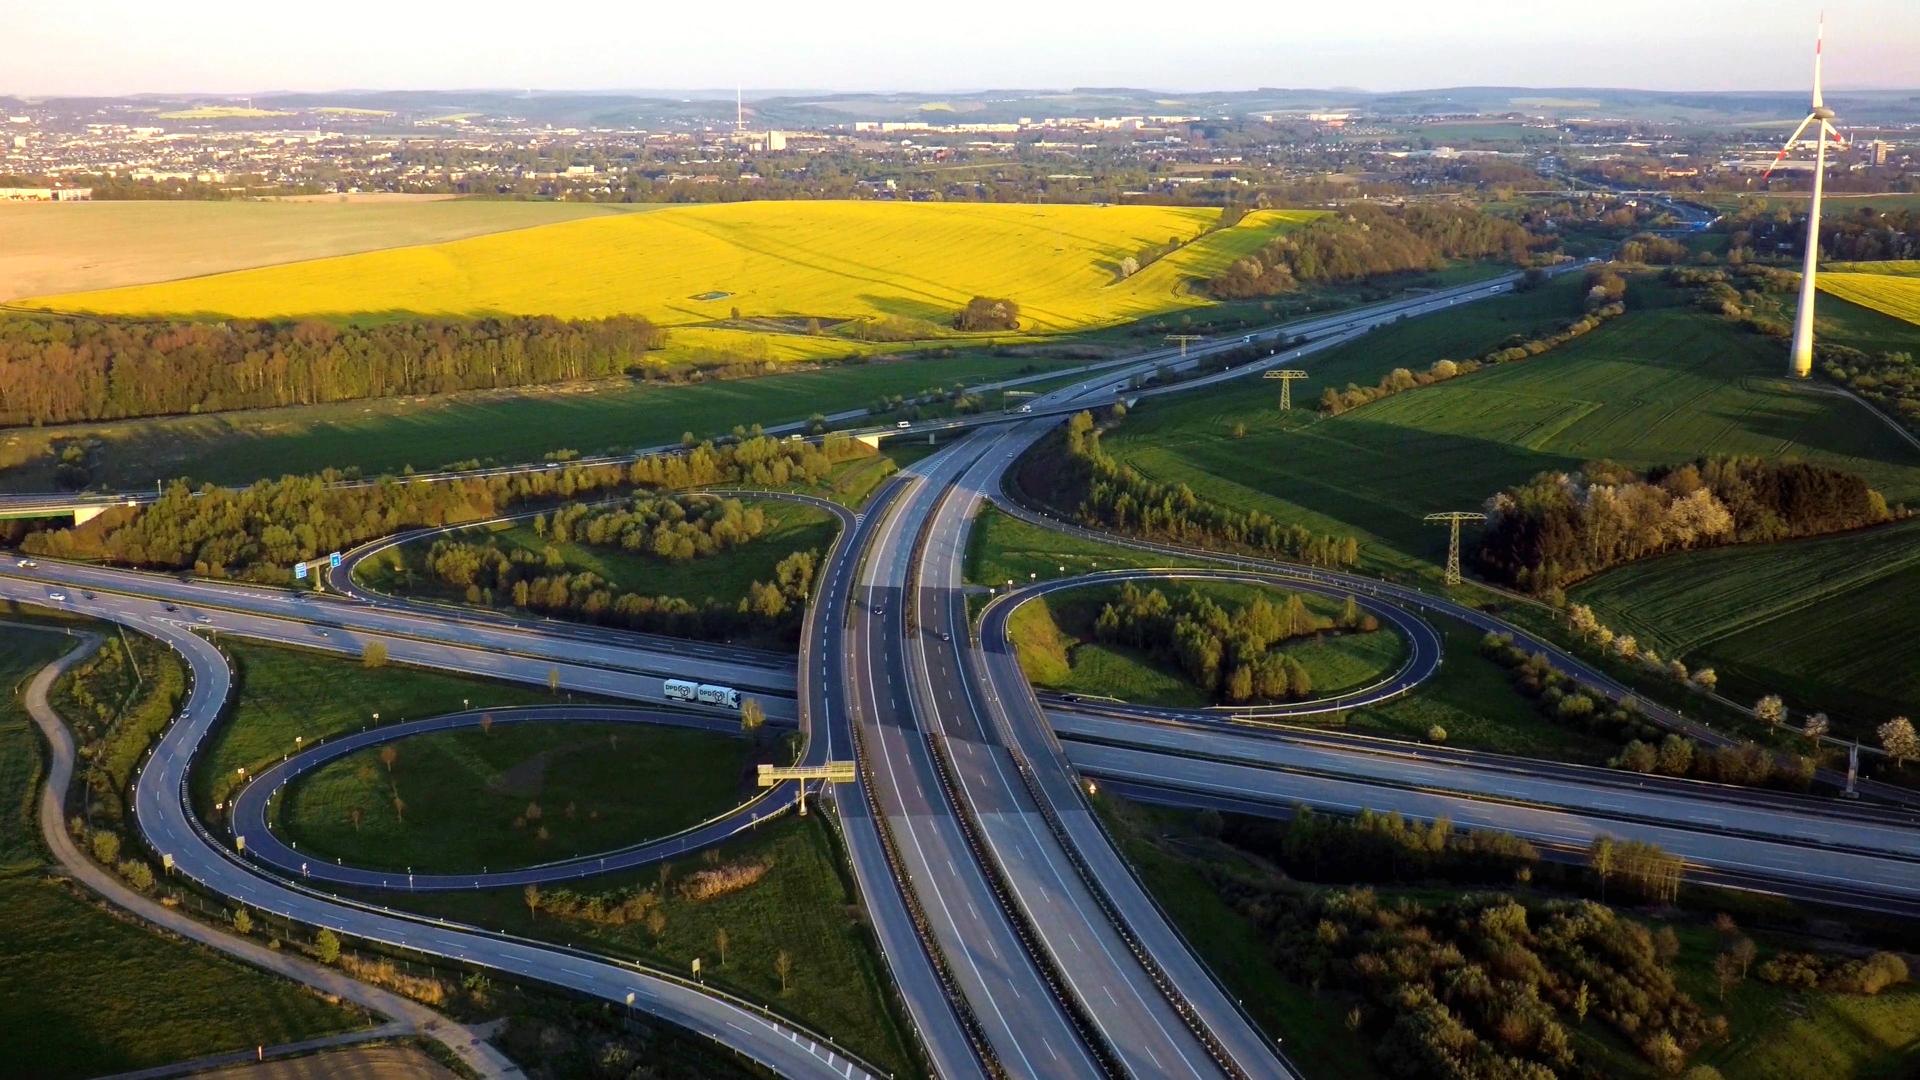 Autobahnkreuz-1080